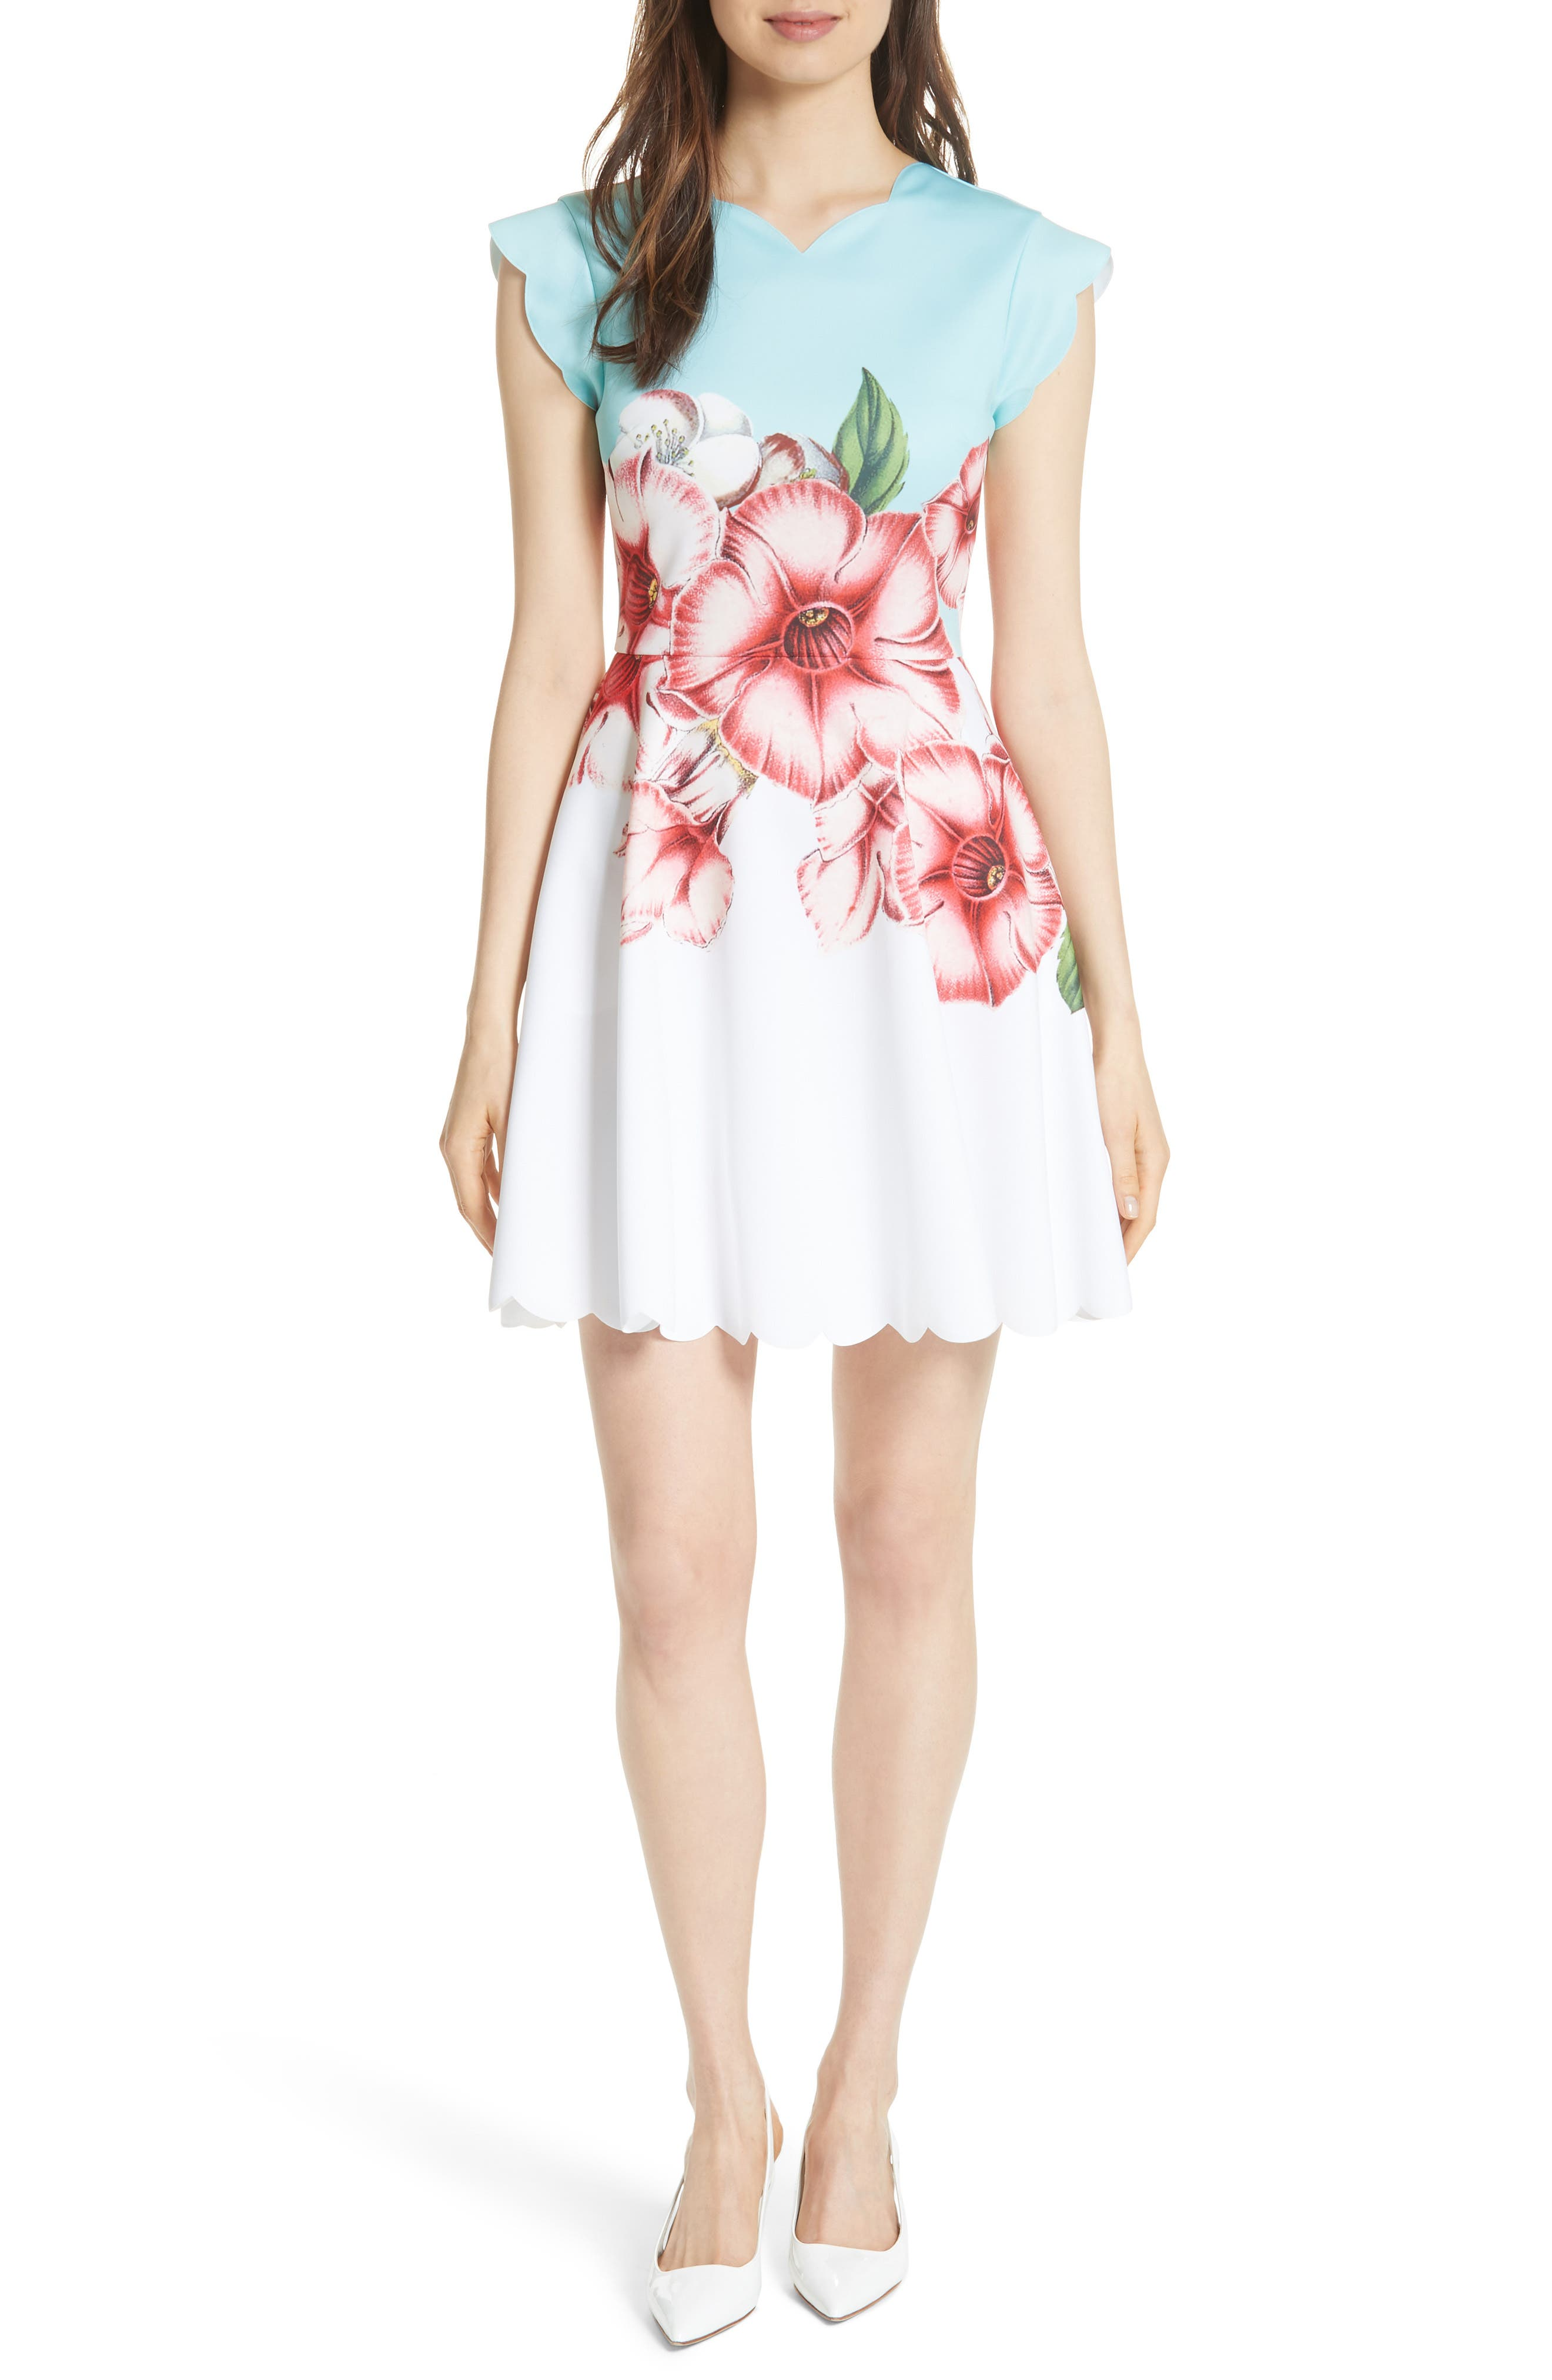 Maevea Nectar Skater Dress,                         Main,                         color, 132